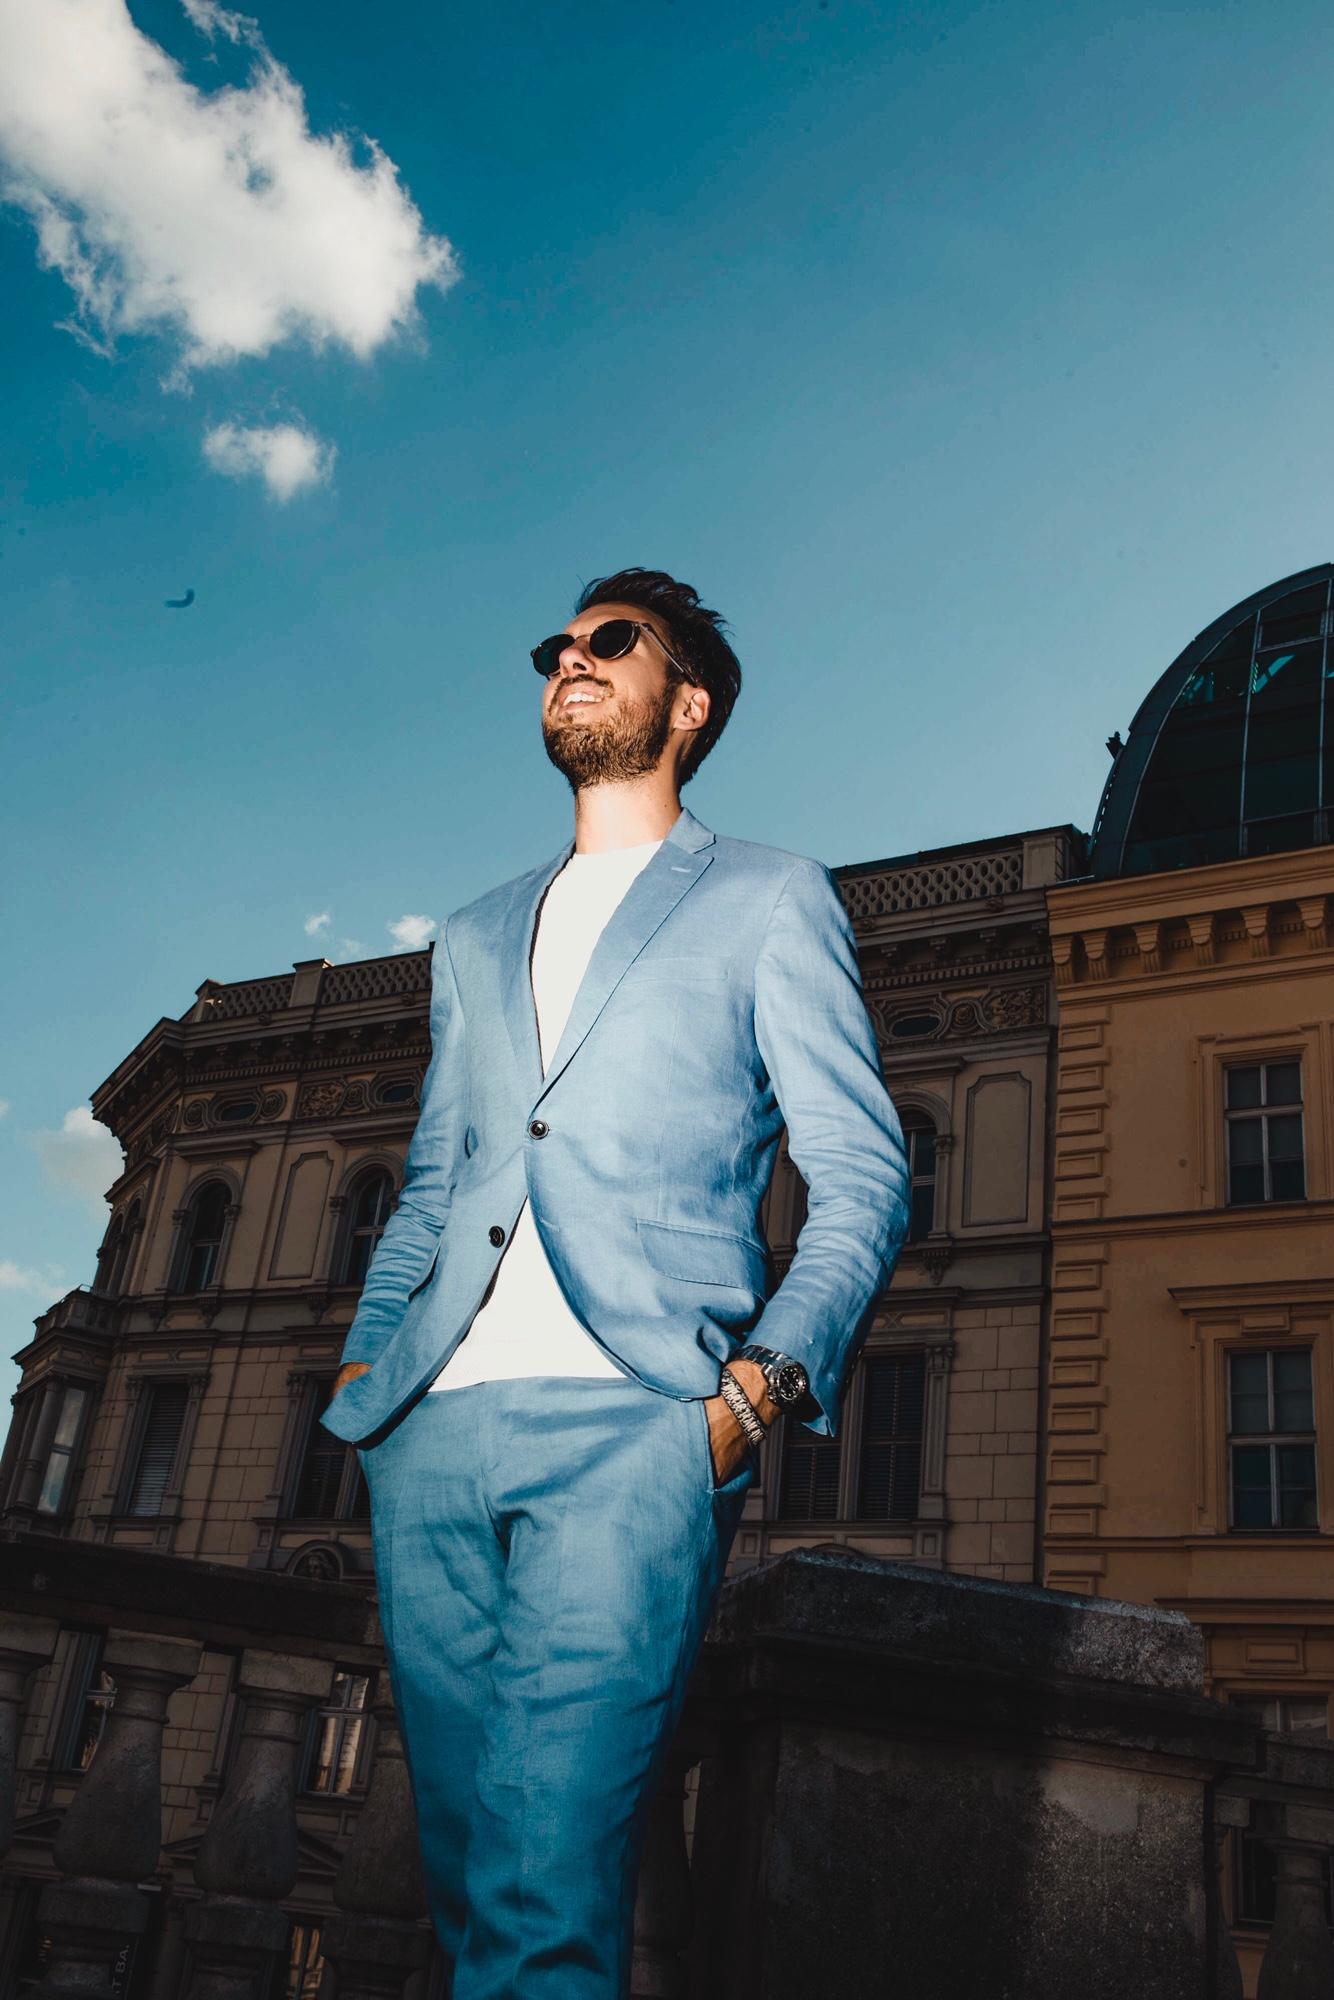 Leinenanzug Sebastian Schmidt 2